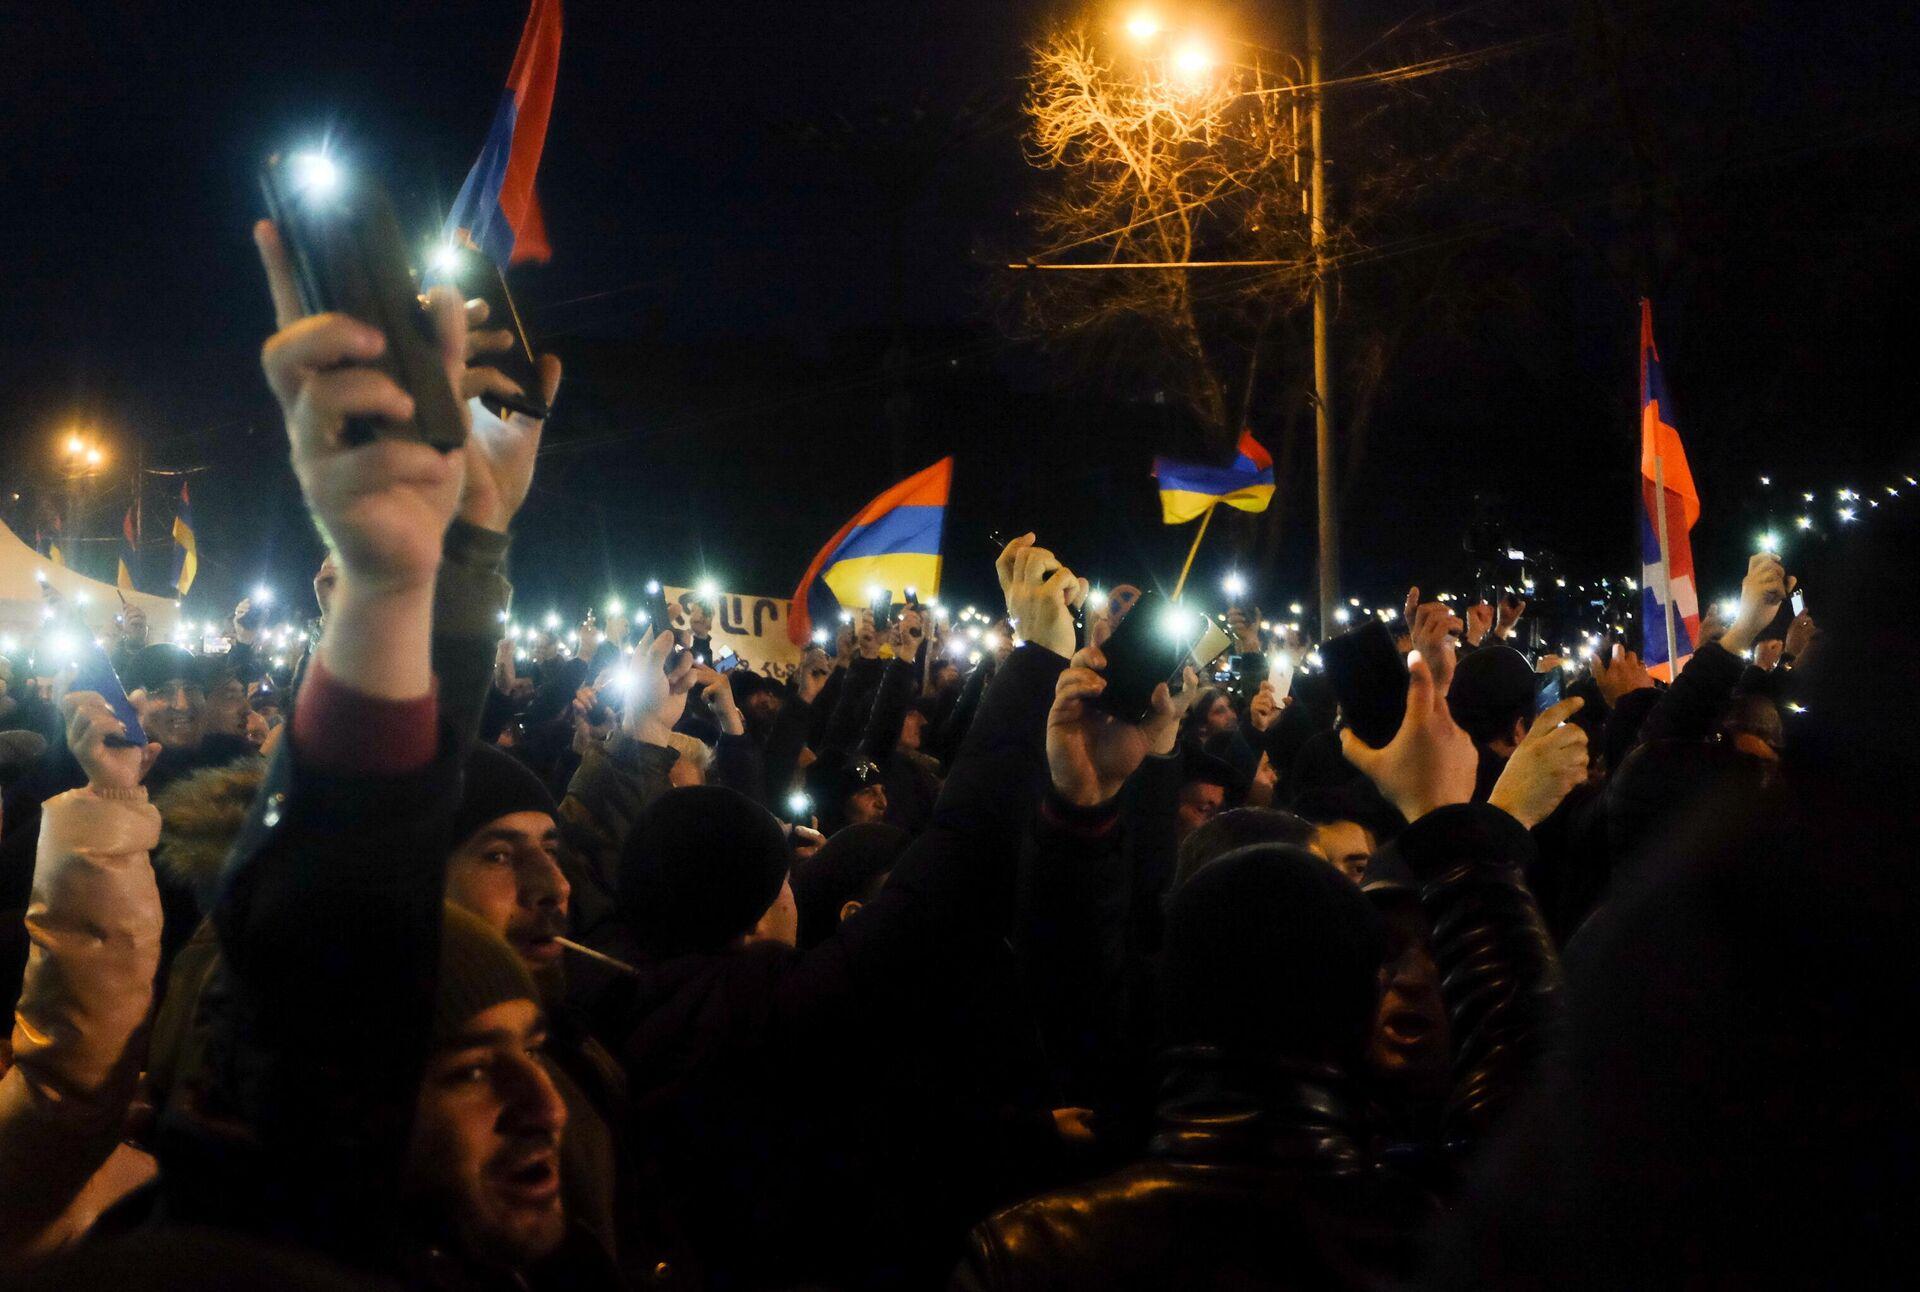 Участники акции протеста оппозиции с требованием отставки премьер-министра Армении Никола Пашиняна на проспекте Баграмяна в Ереване - РИА Новости, 1920, 02.03.2021